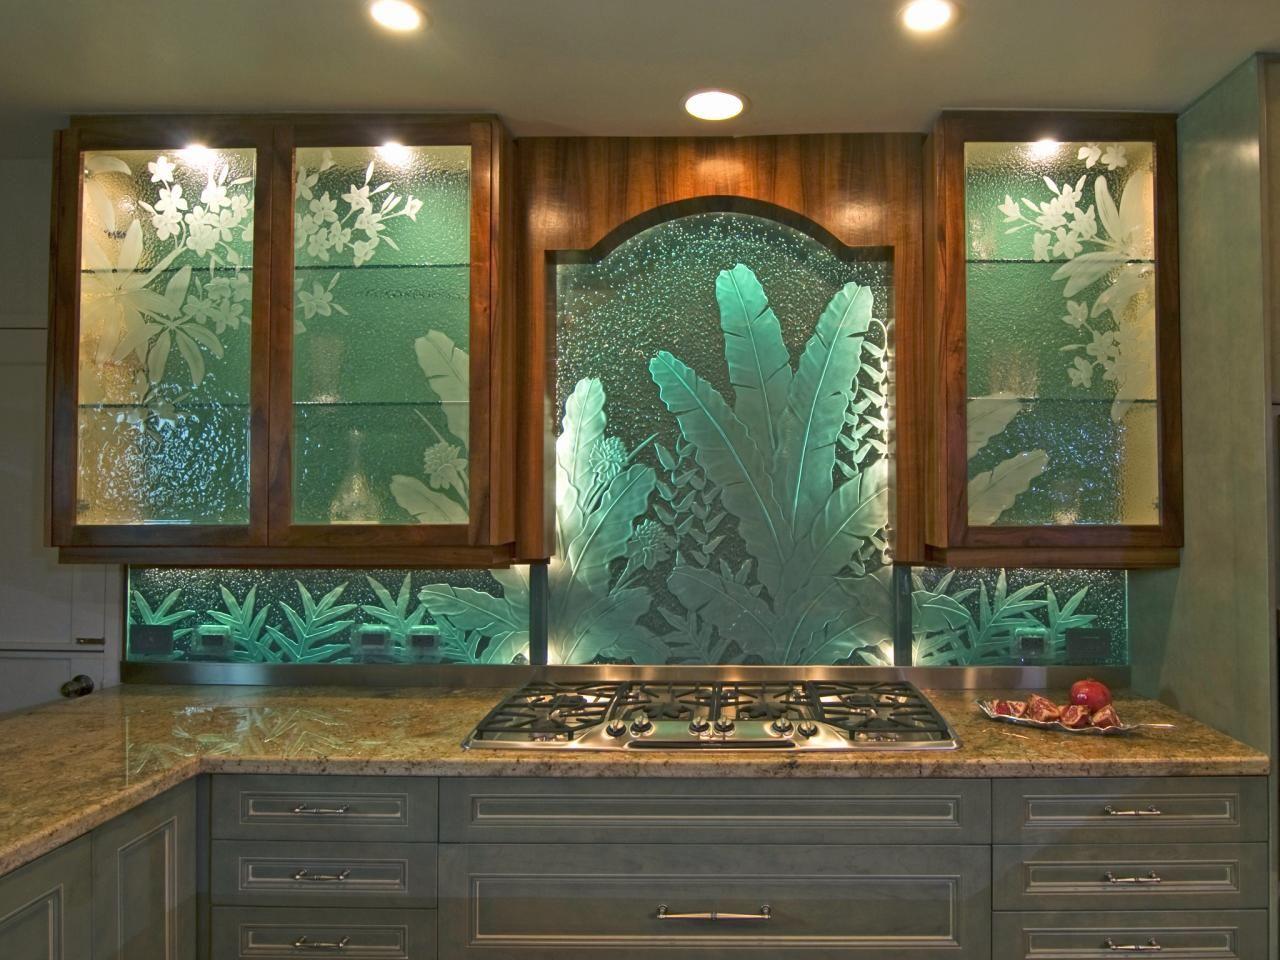 30 Trendiest Kitchen Backsplash Materials  Light Highlights Extraordinary Kitchen Design Hawaii Review